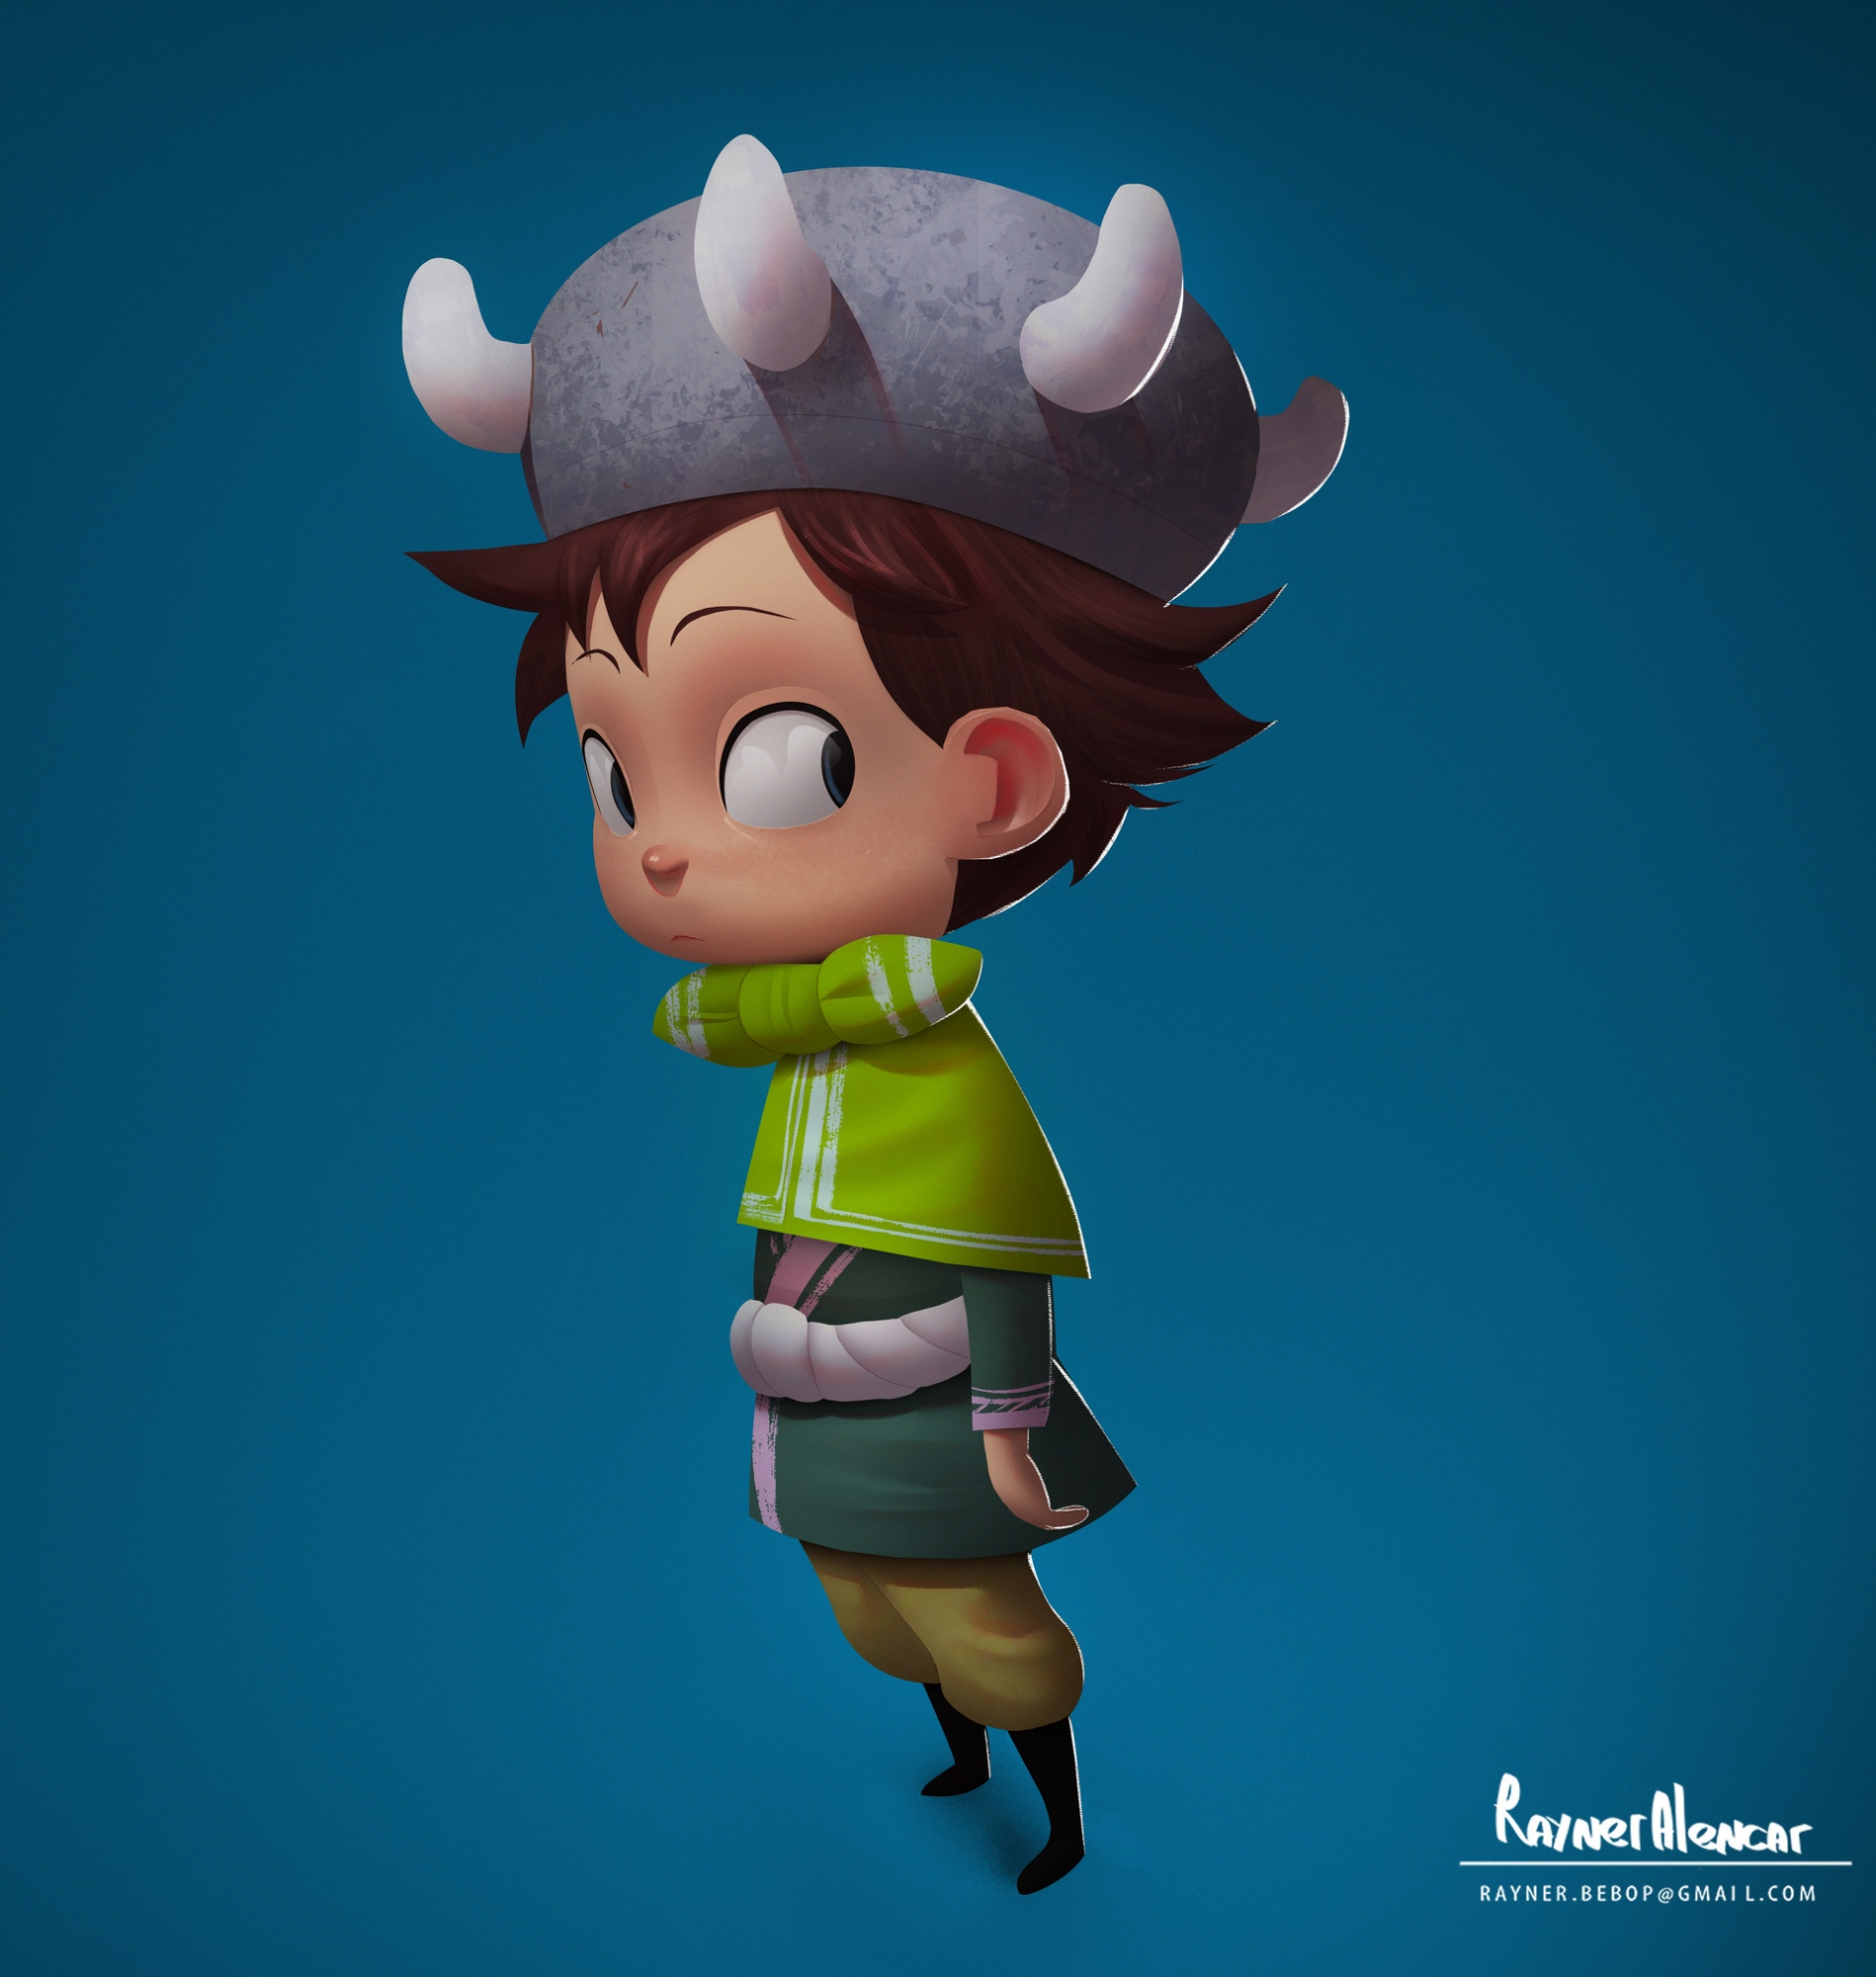 rayner-alencar-character-design